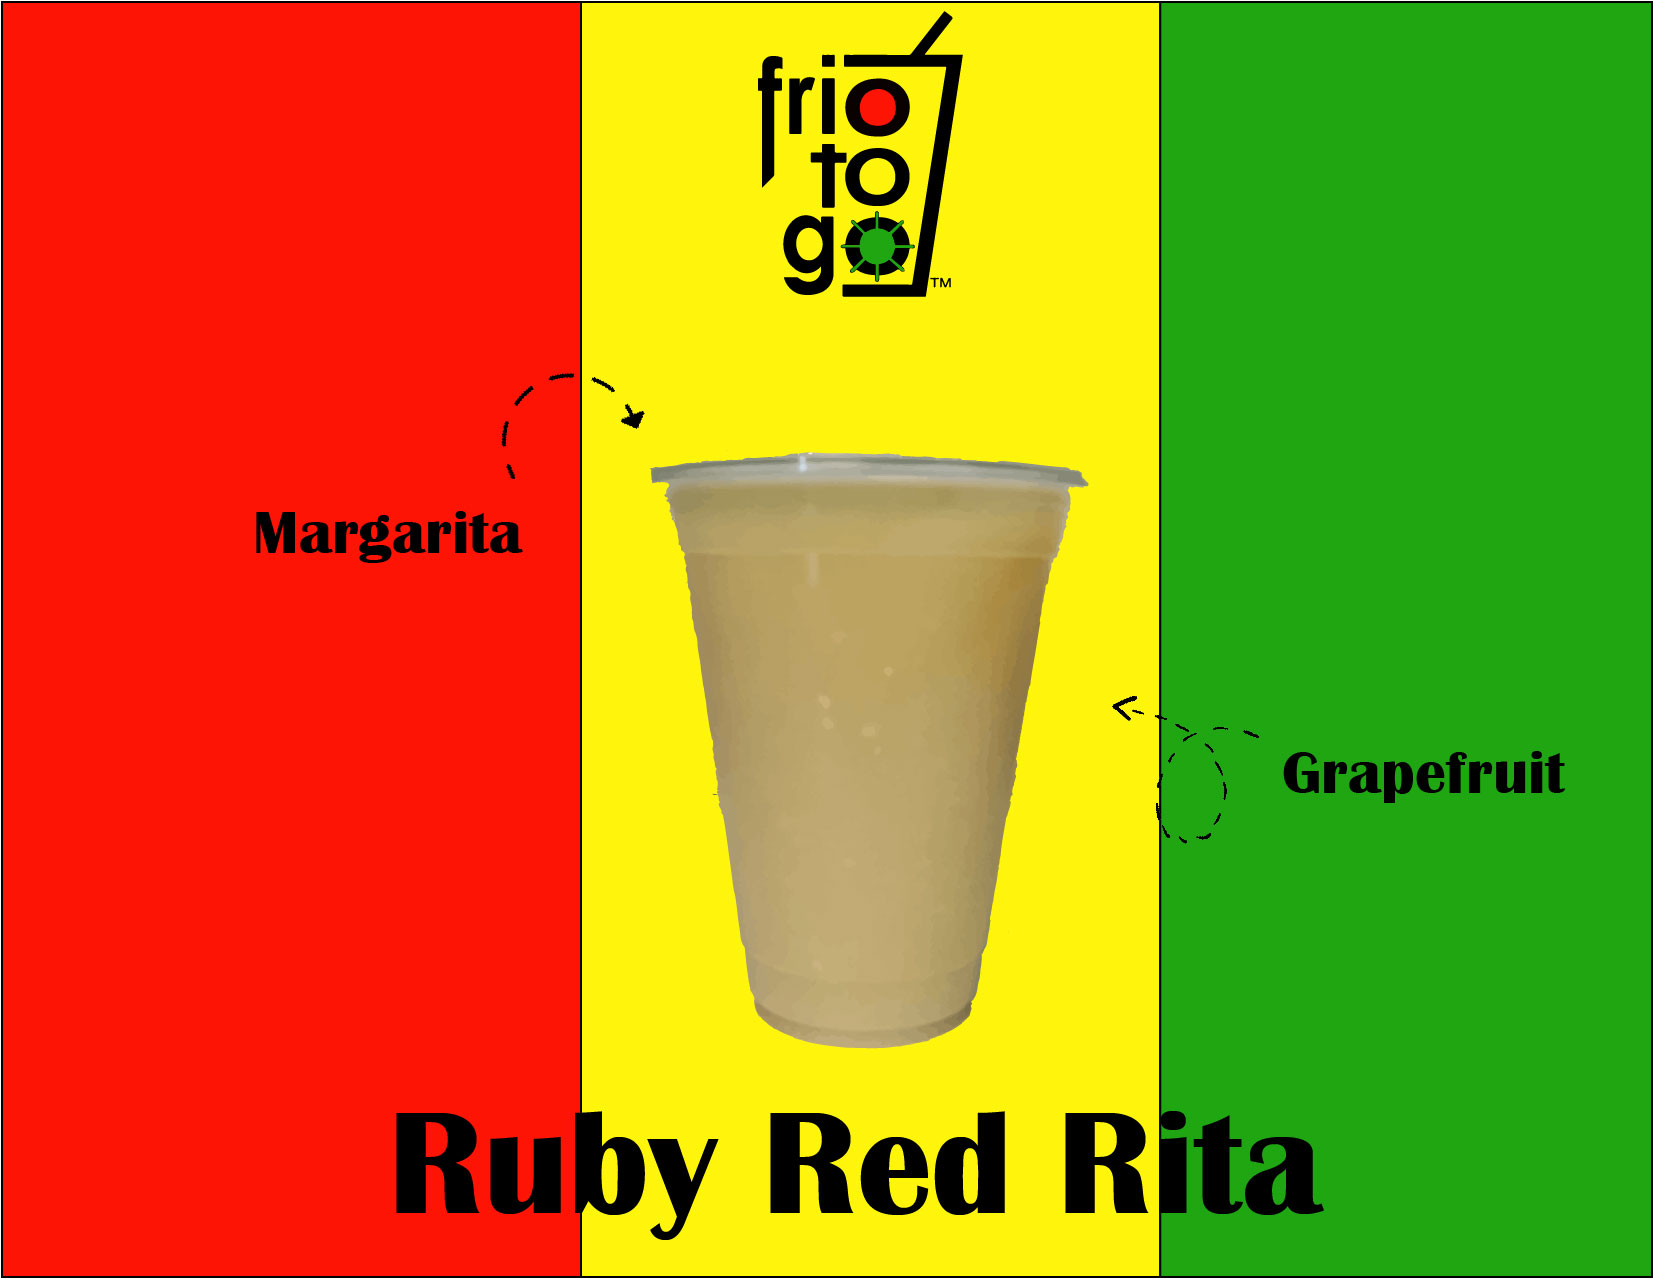 Ruby Red Rita